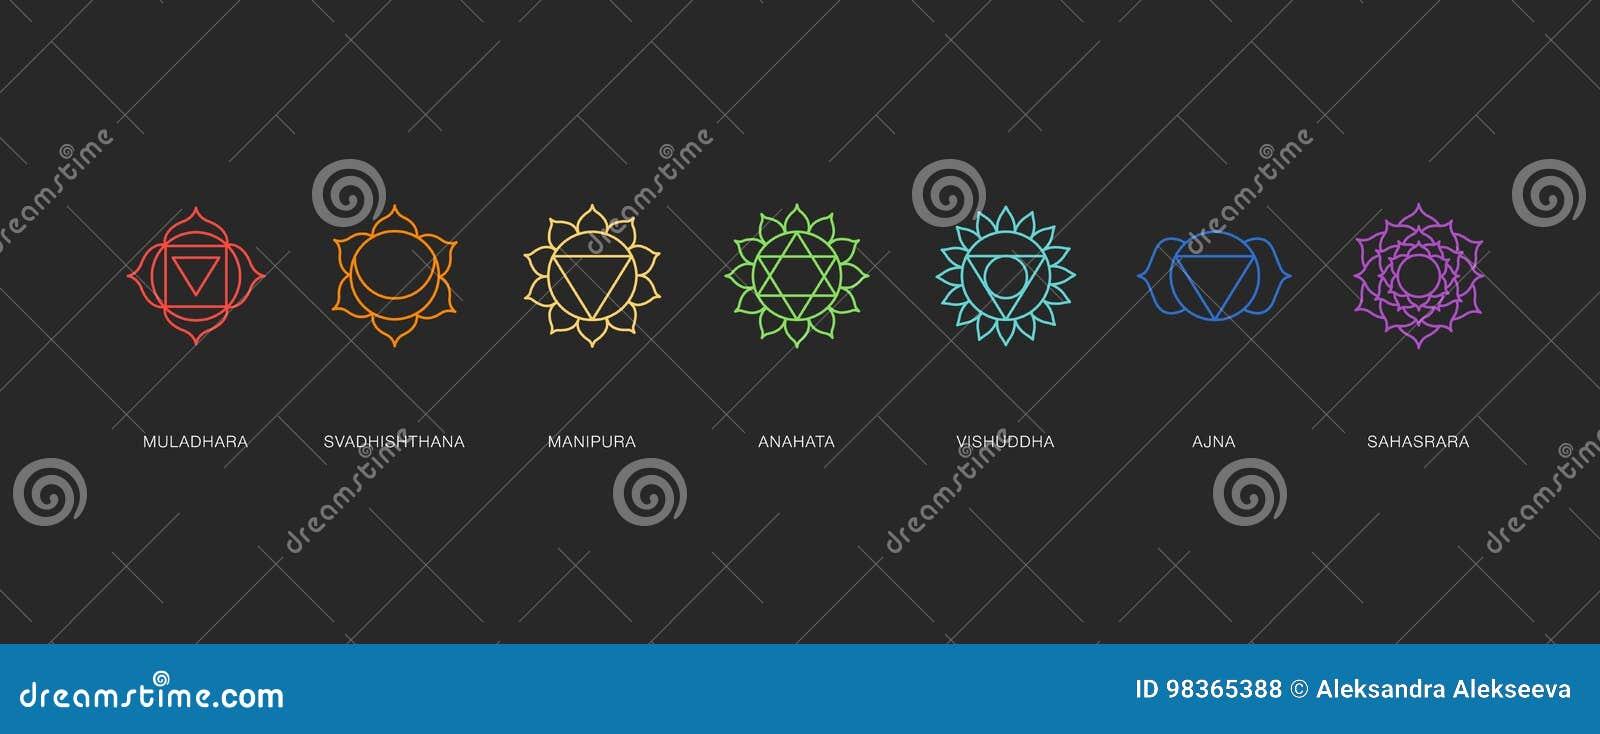 Chakras Energy Healing Sacred Geometry Vector Stock Vector